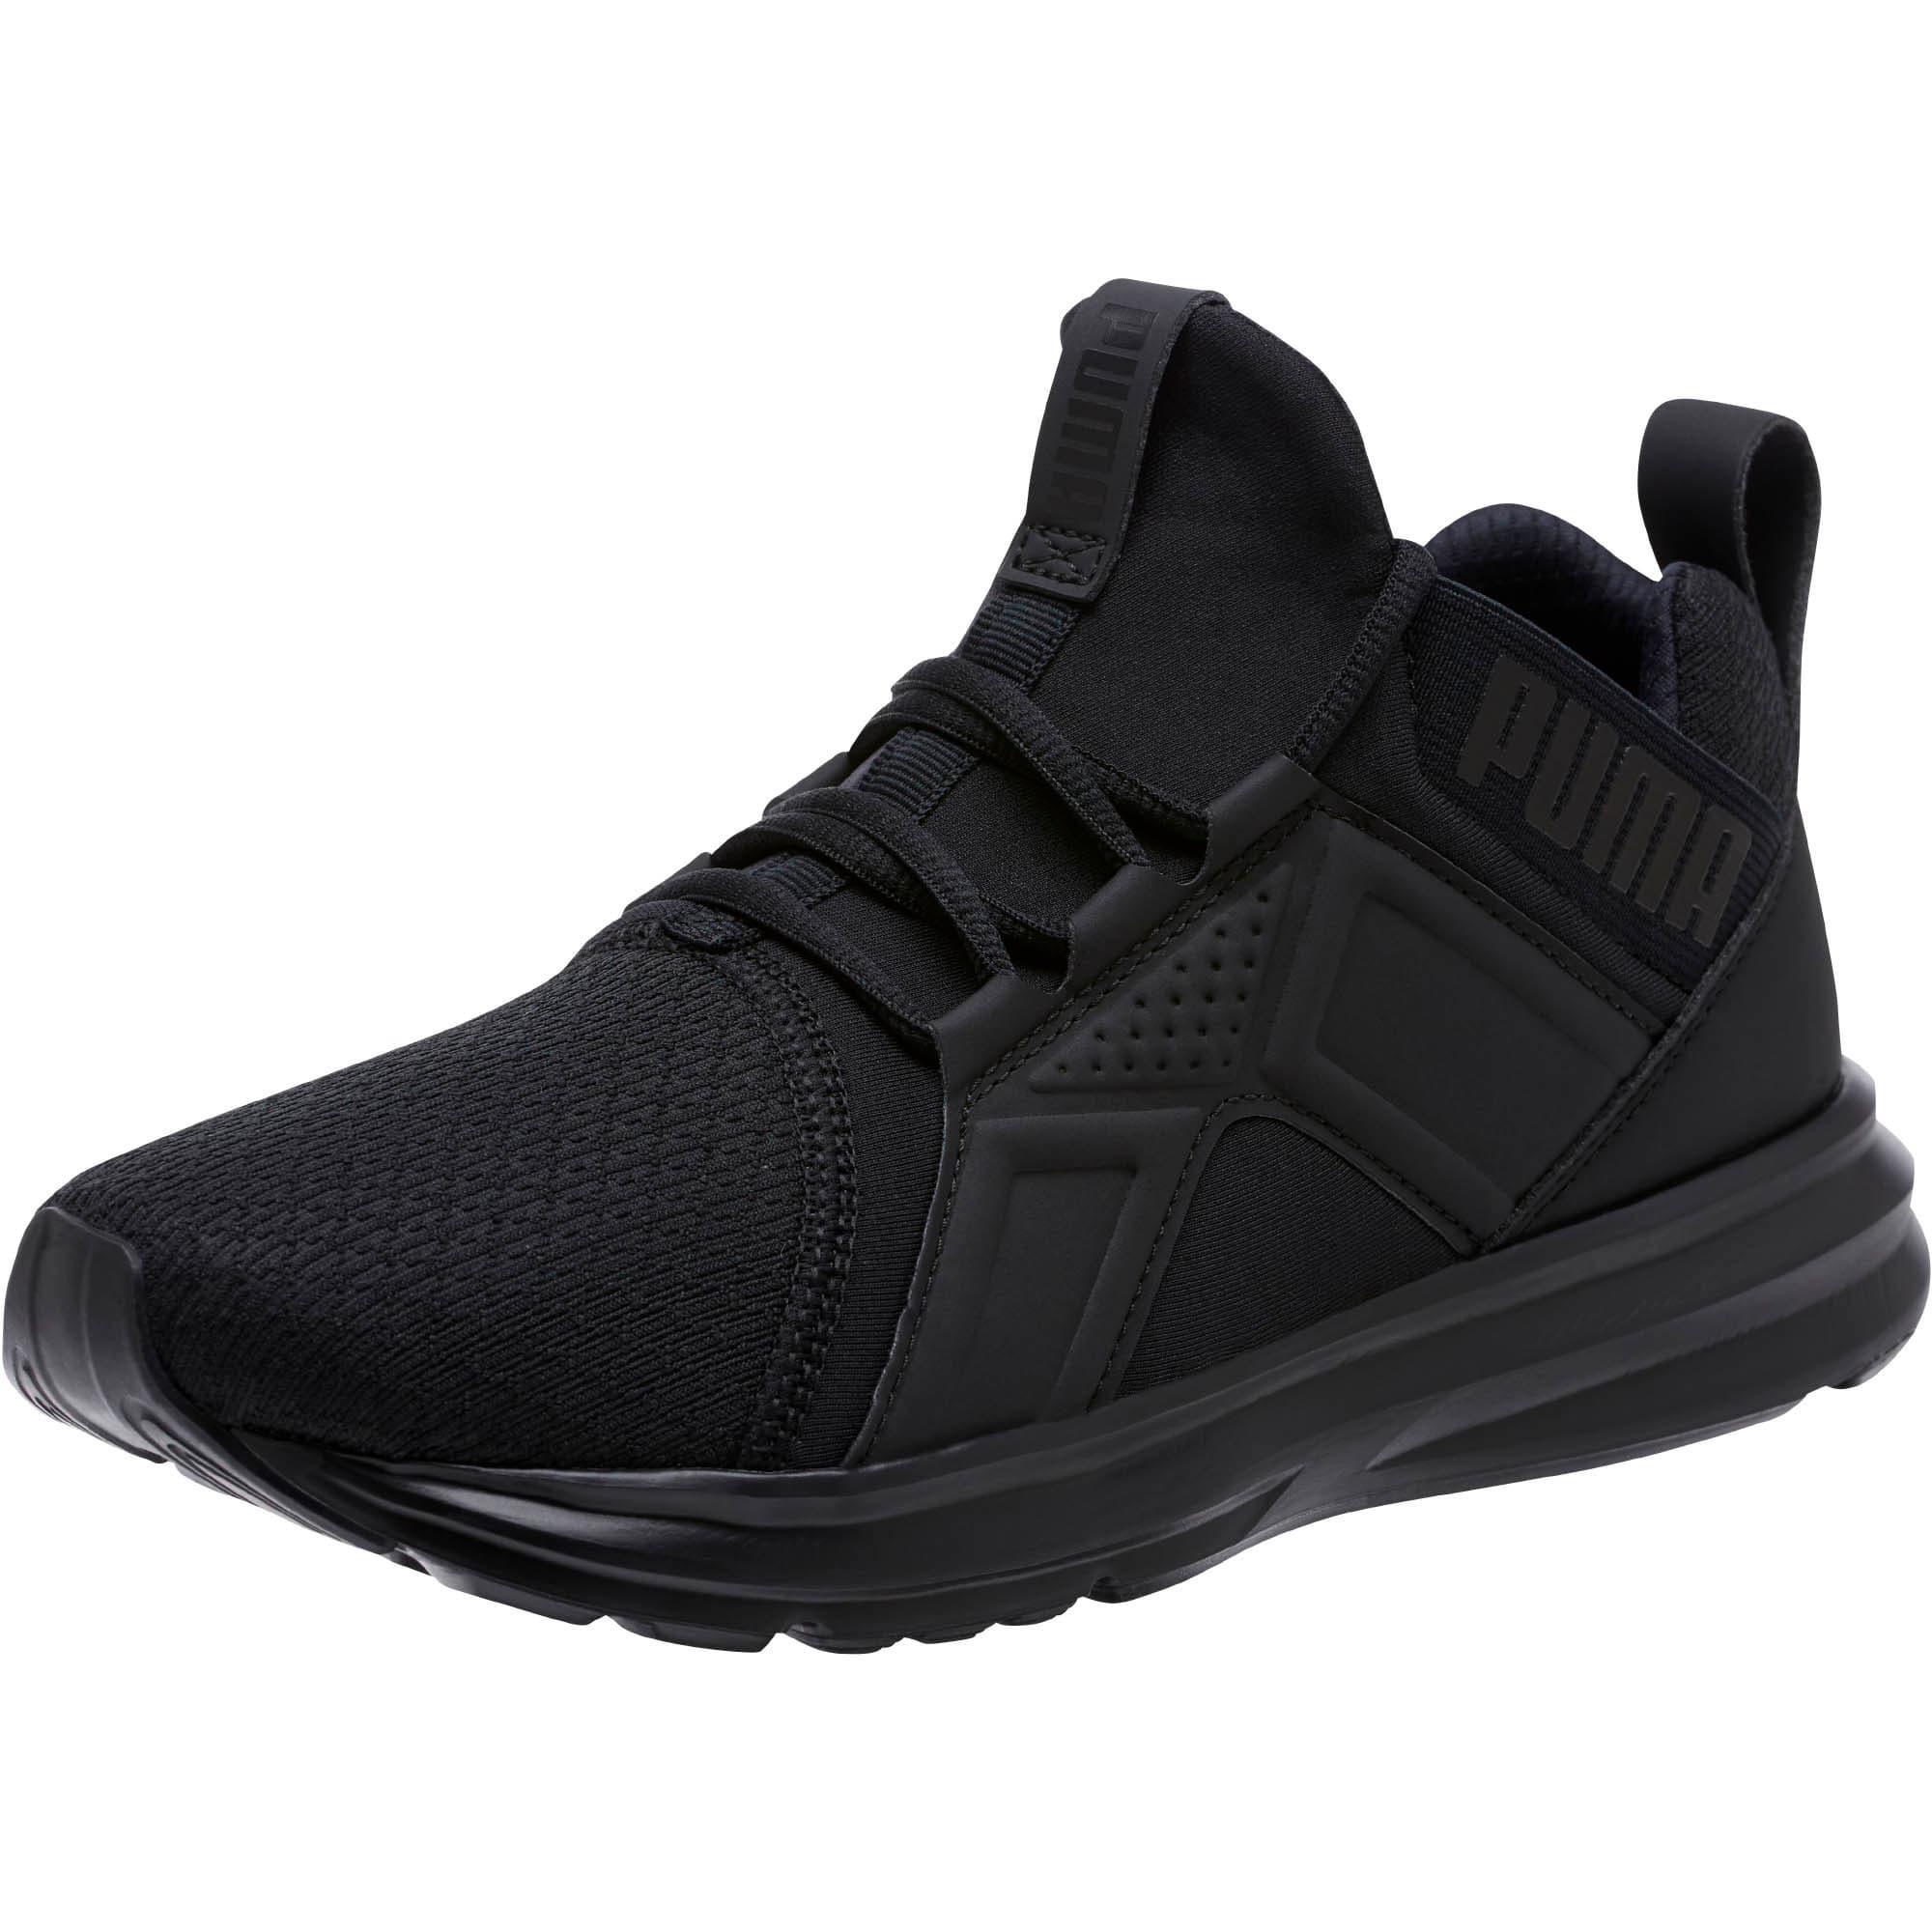 Thumbnail 1 of Zenvo Women's Training Shoes, Puma Black-Puma Black, medium